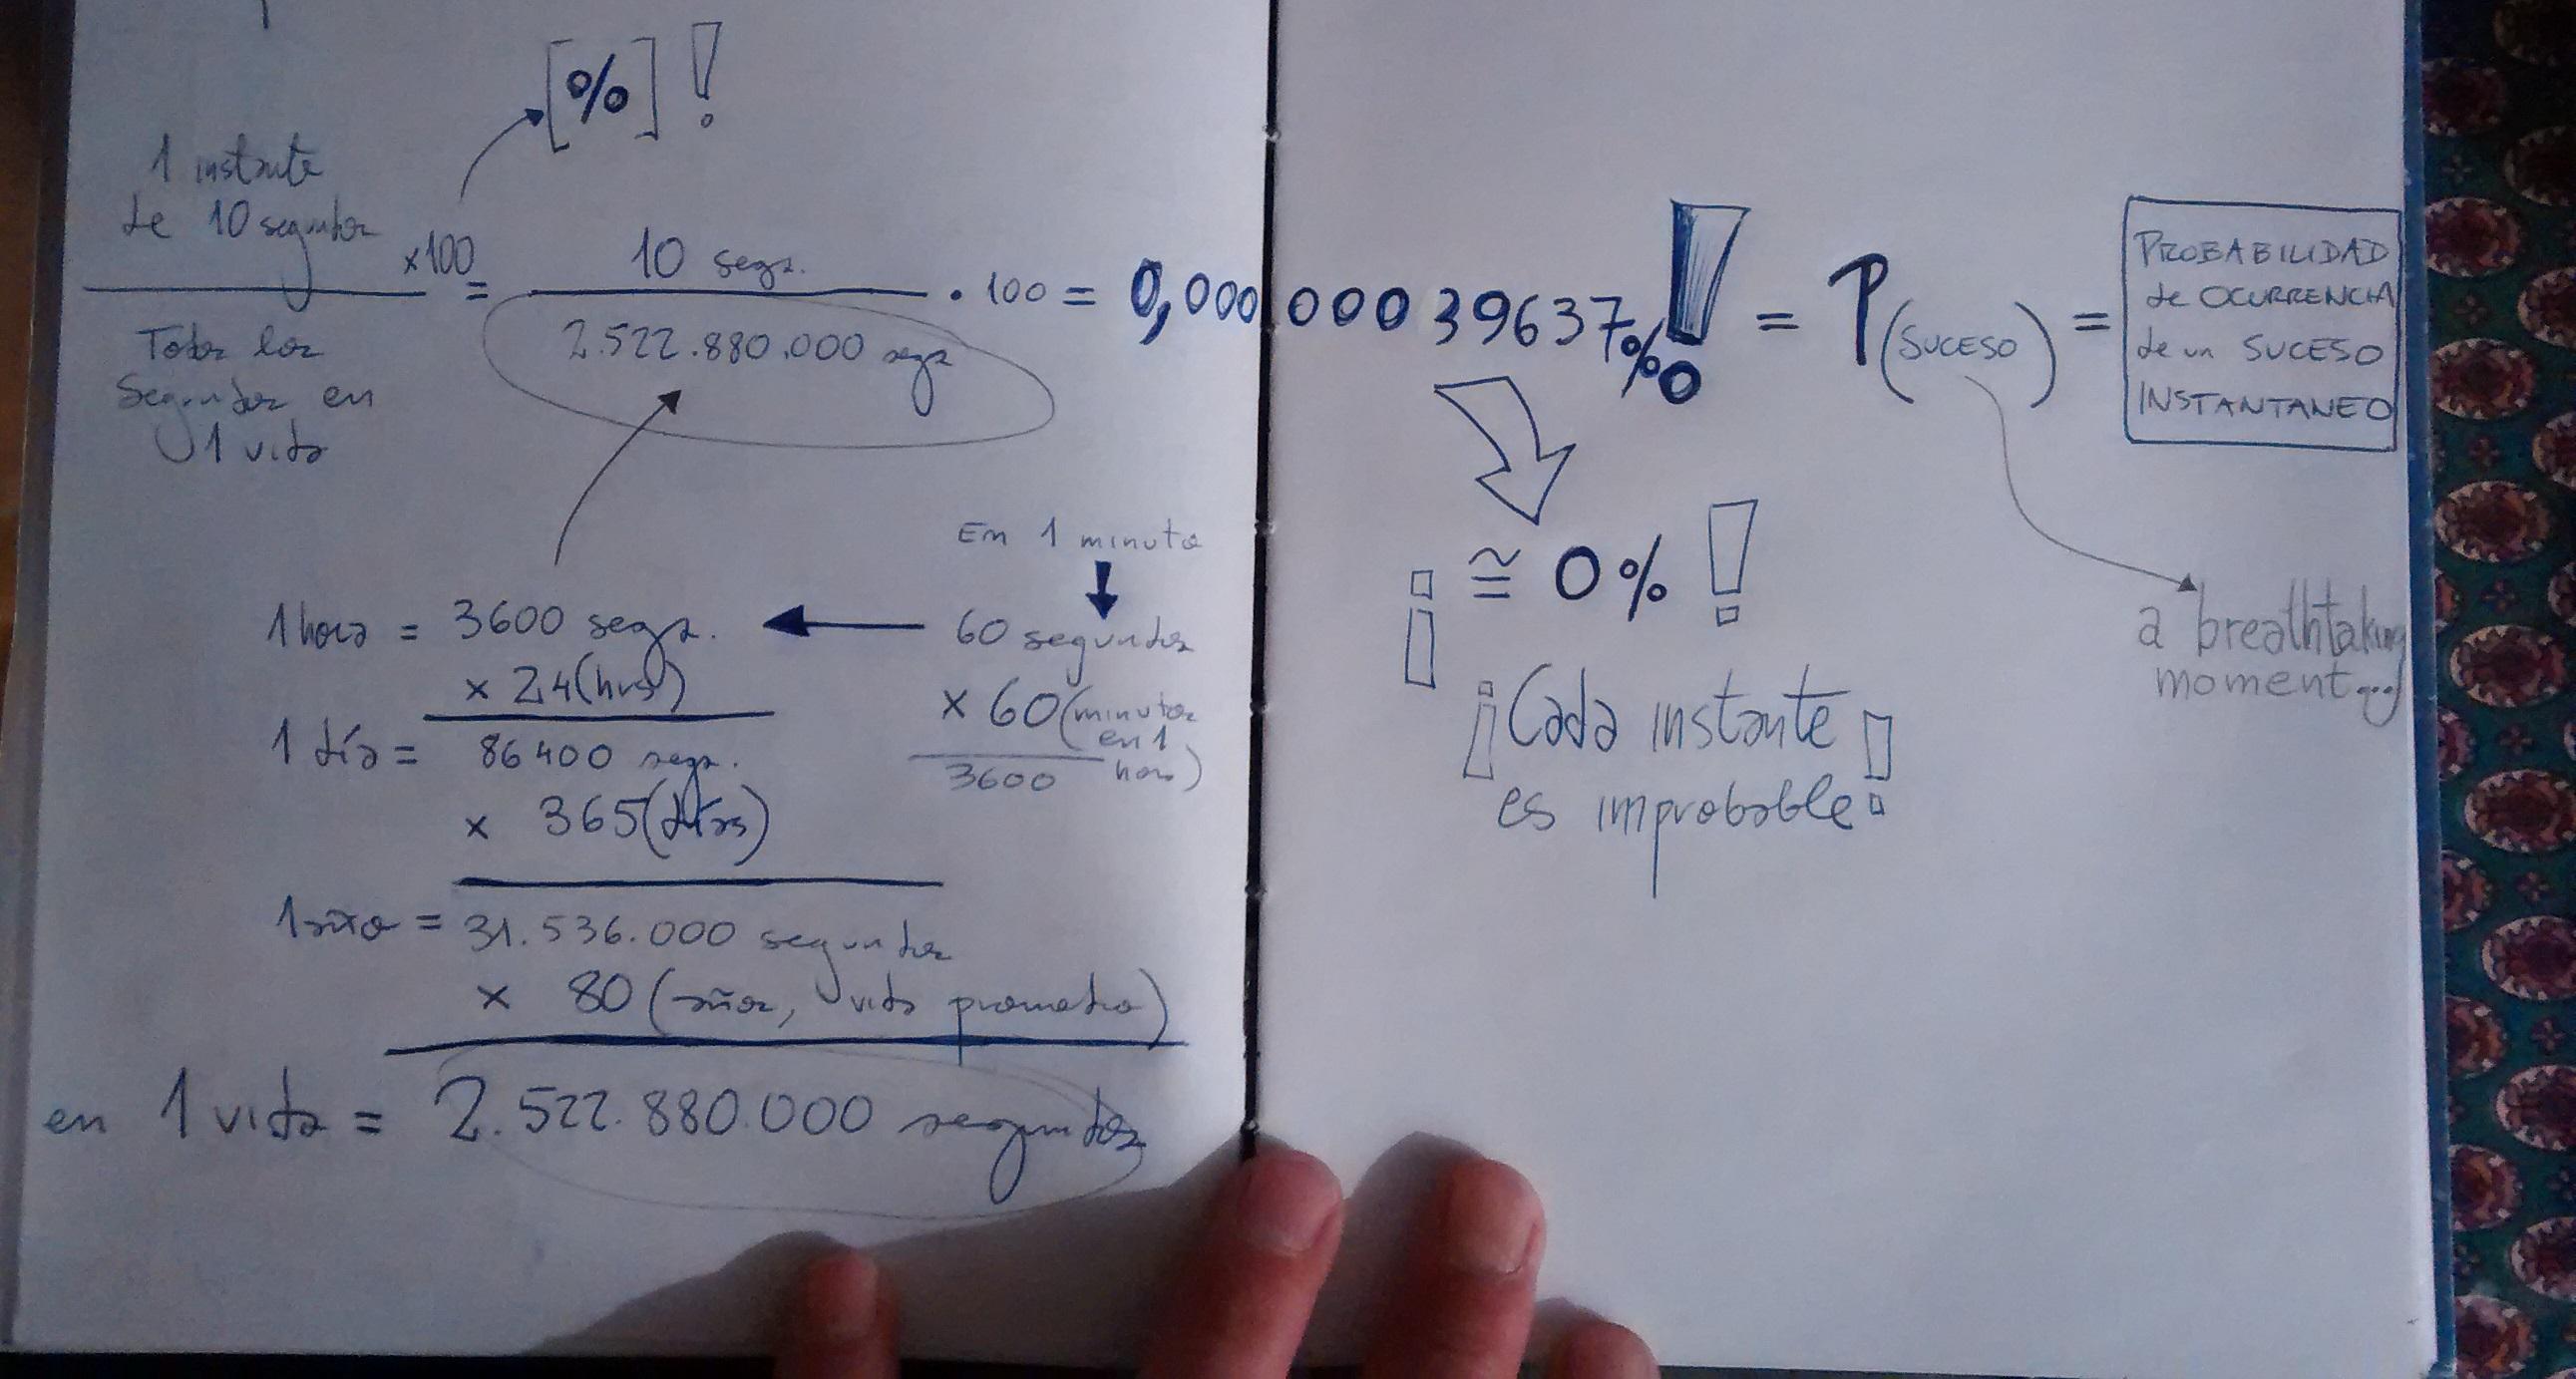 ba-231-breathtaking-moment-probability